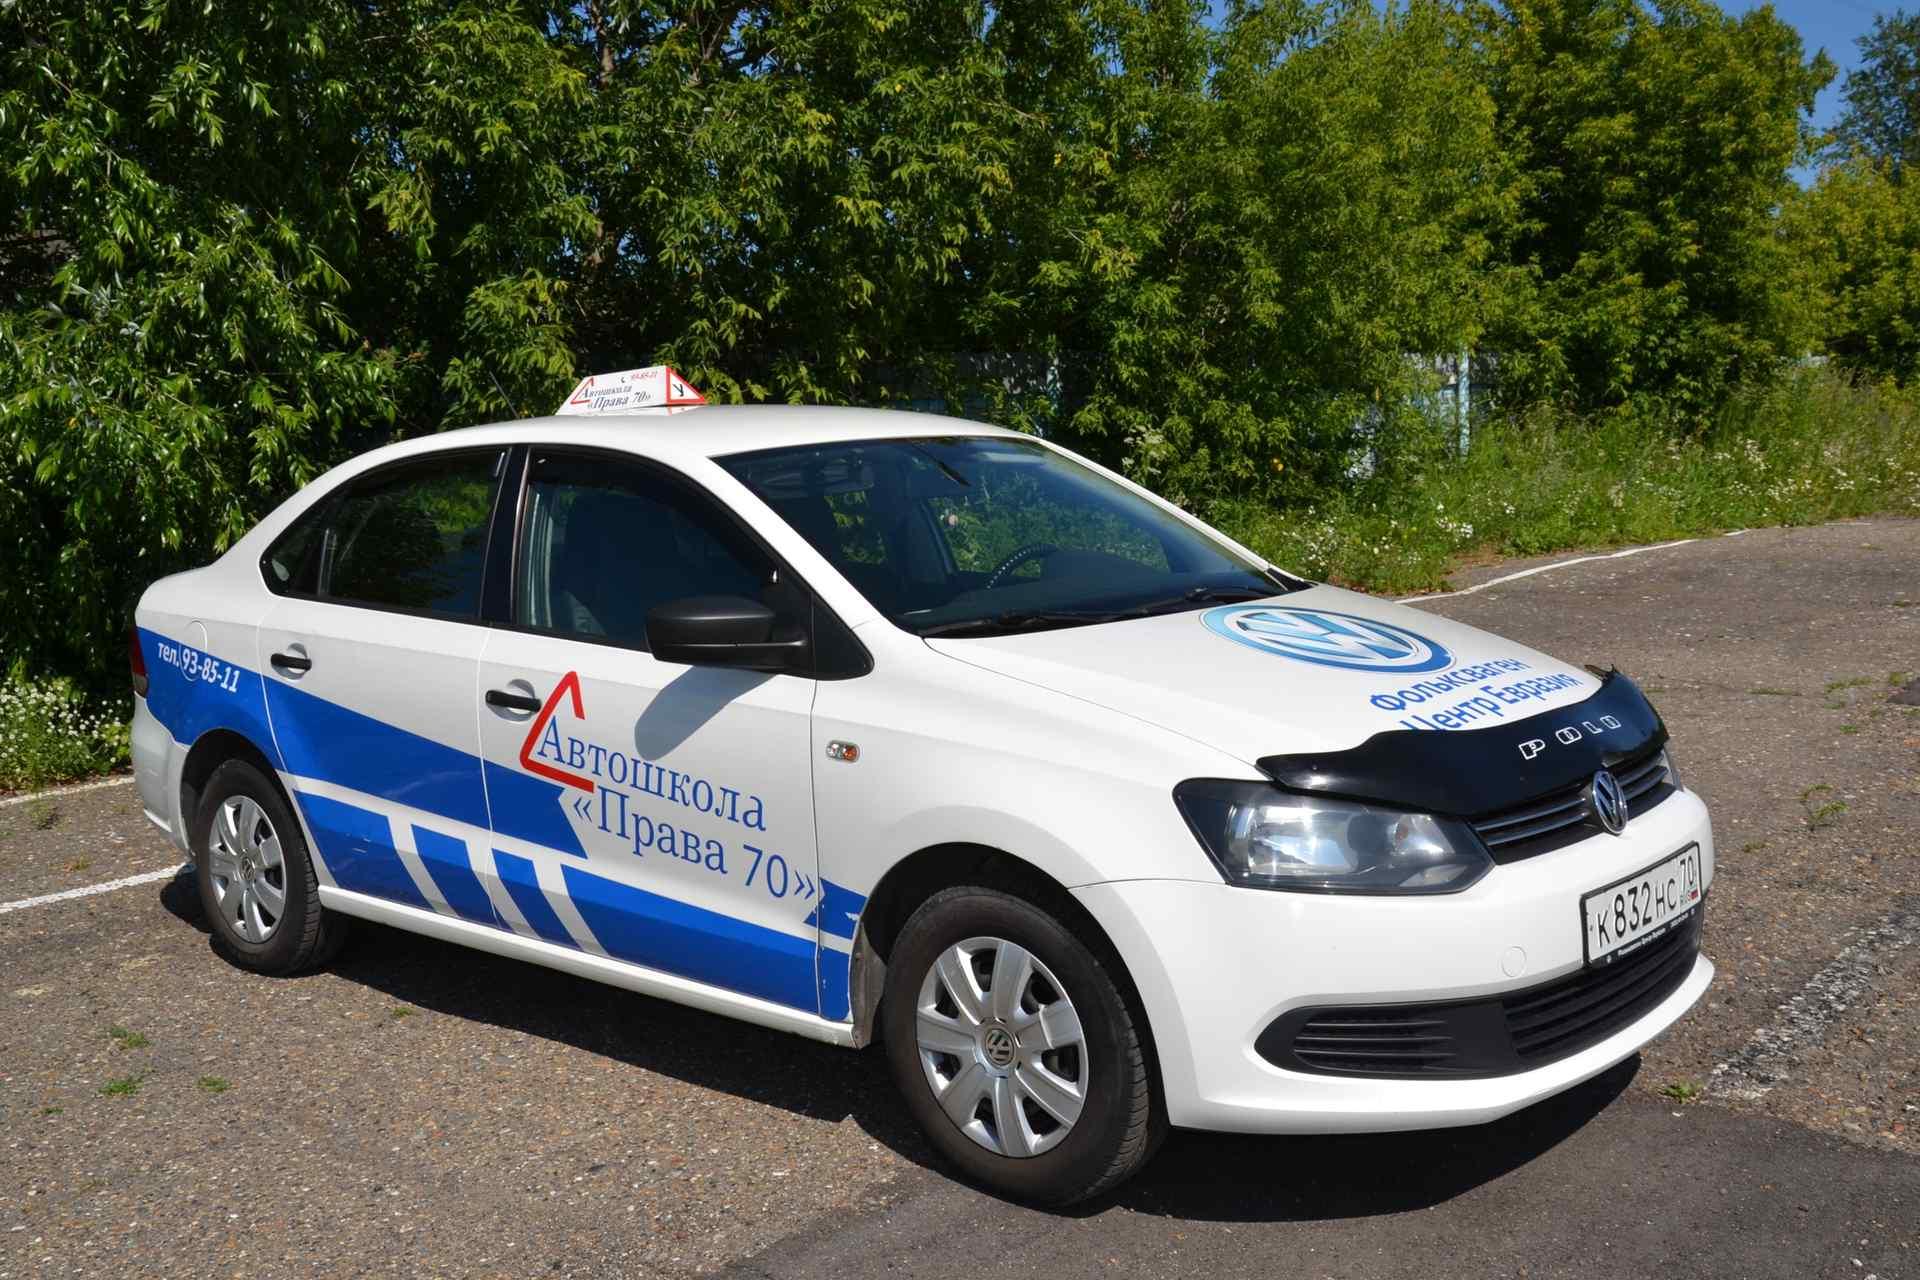 Автошкола Права 70 Volkswagen Polo Инструтор Игнатьев М.Н.